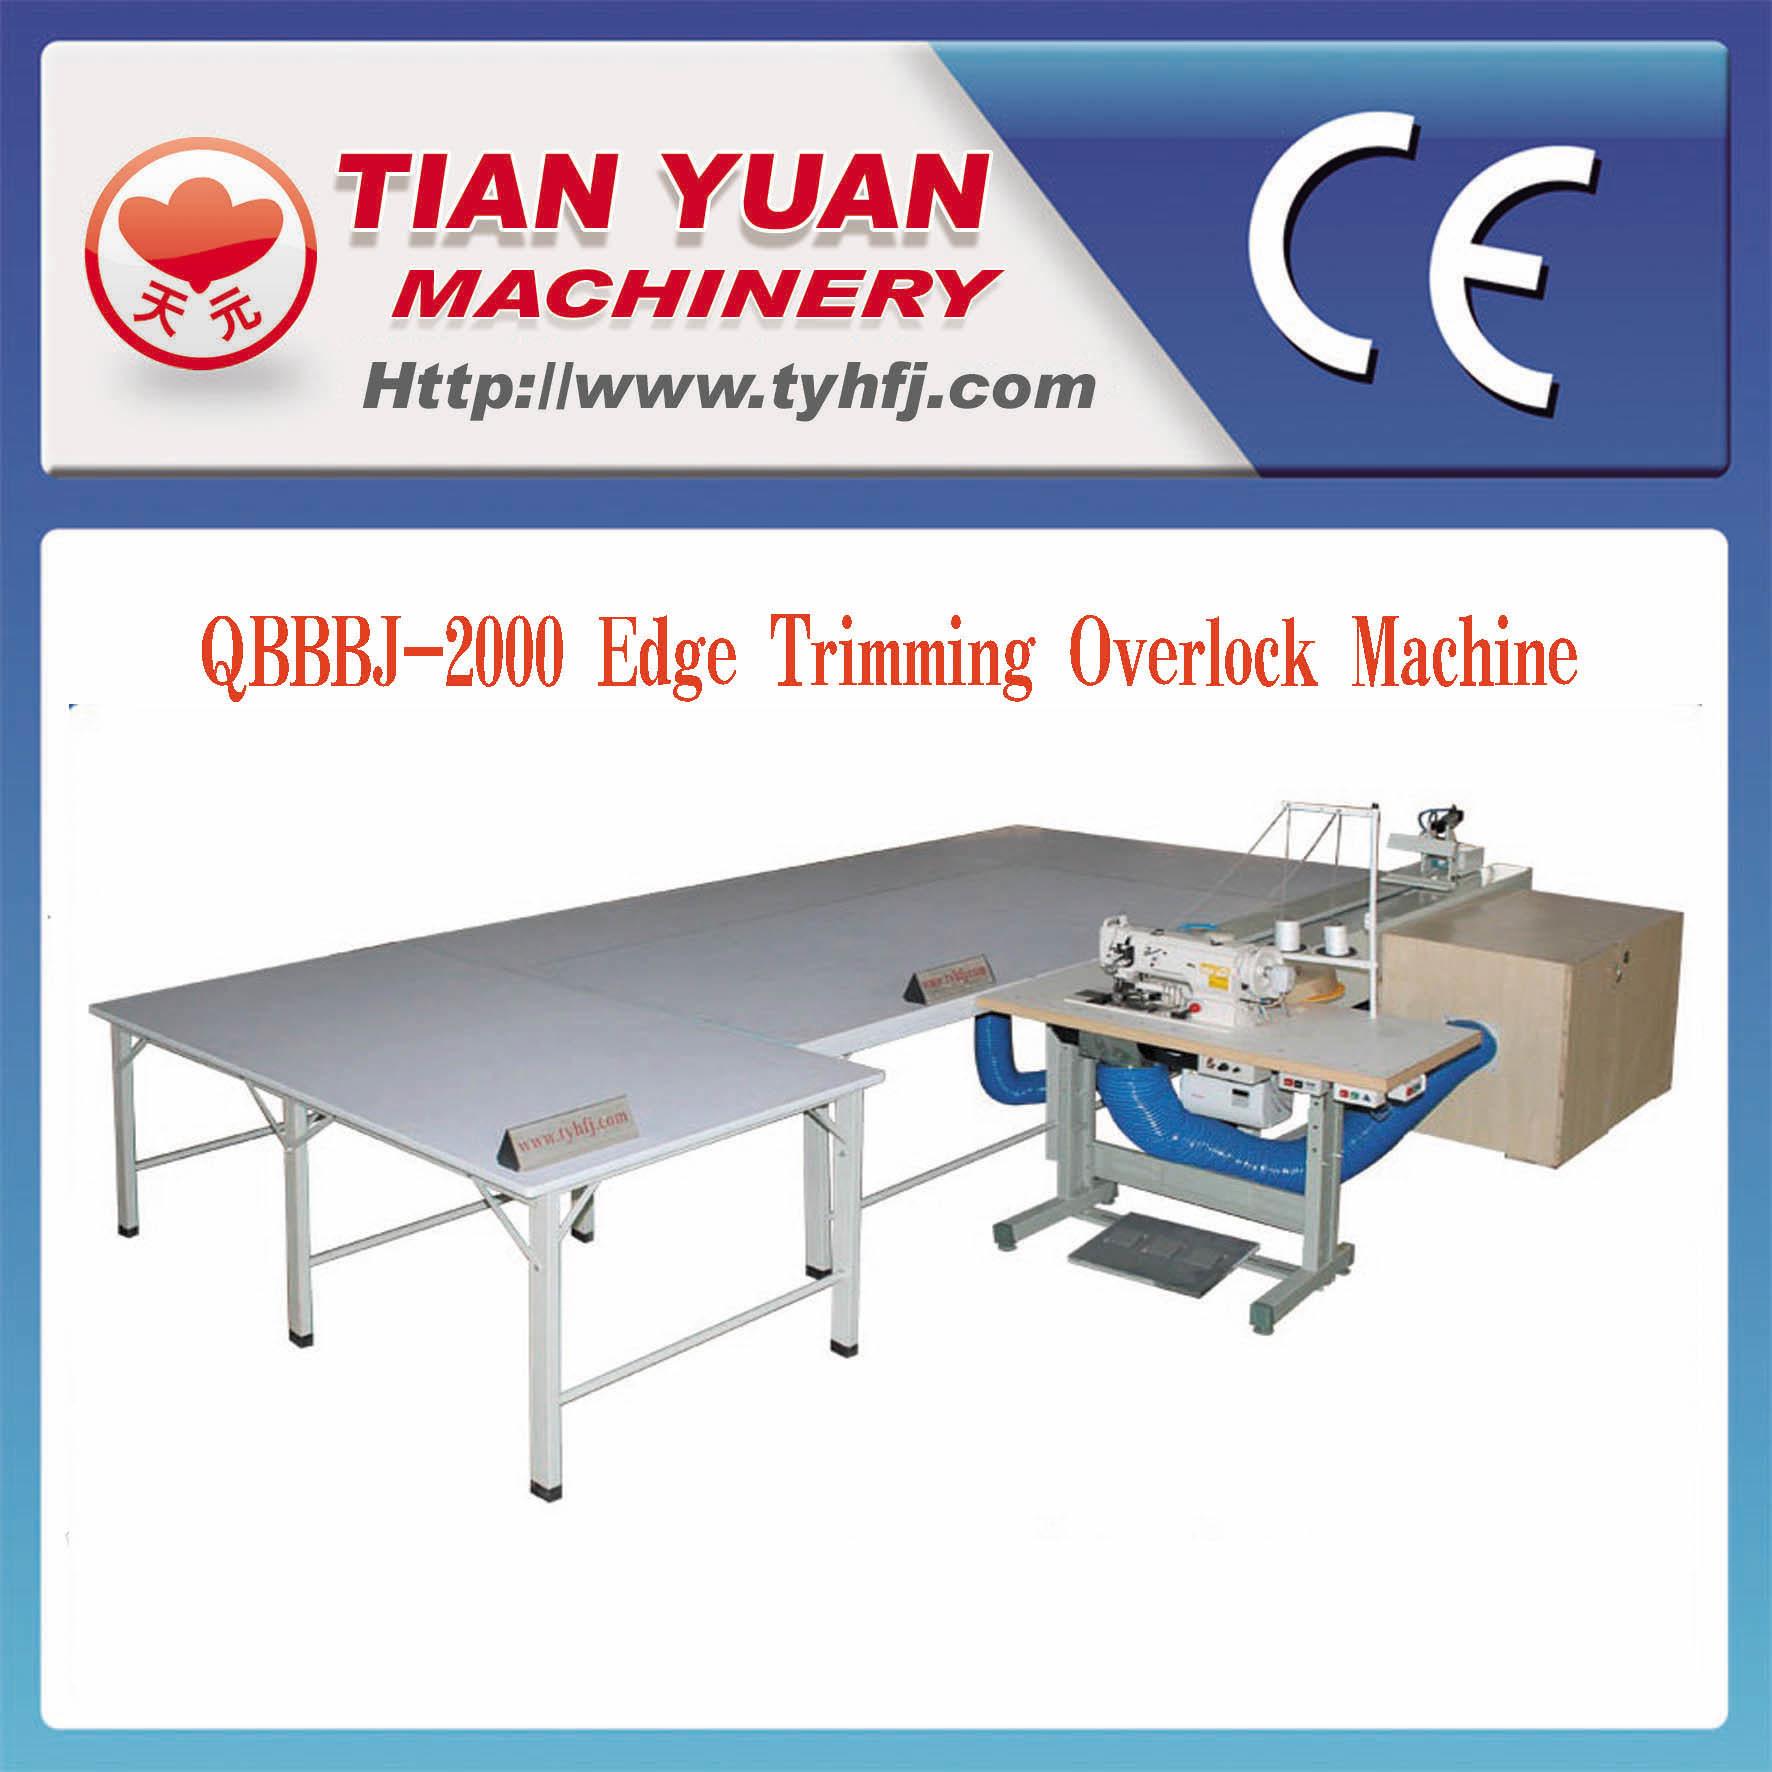 Edge Trimming and Overlock Machine (QBBBJ-2000)